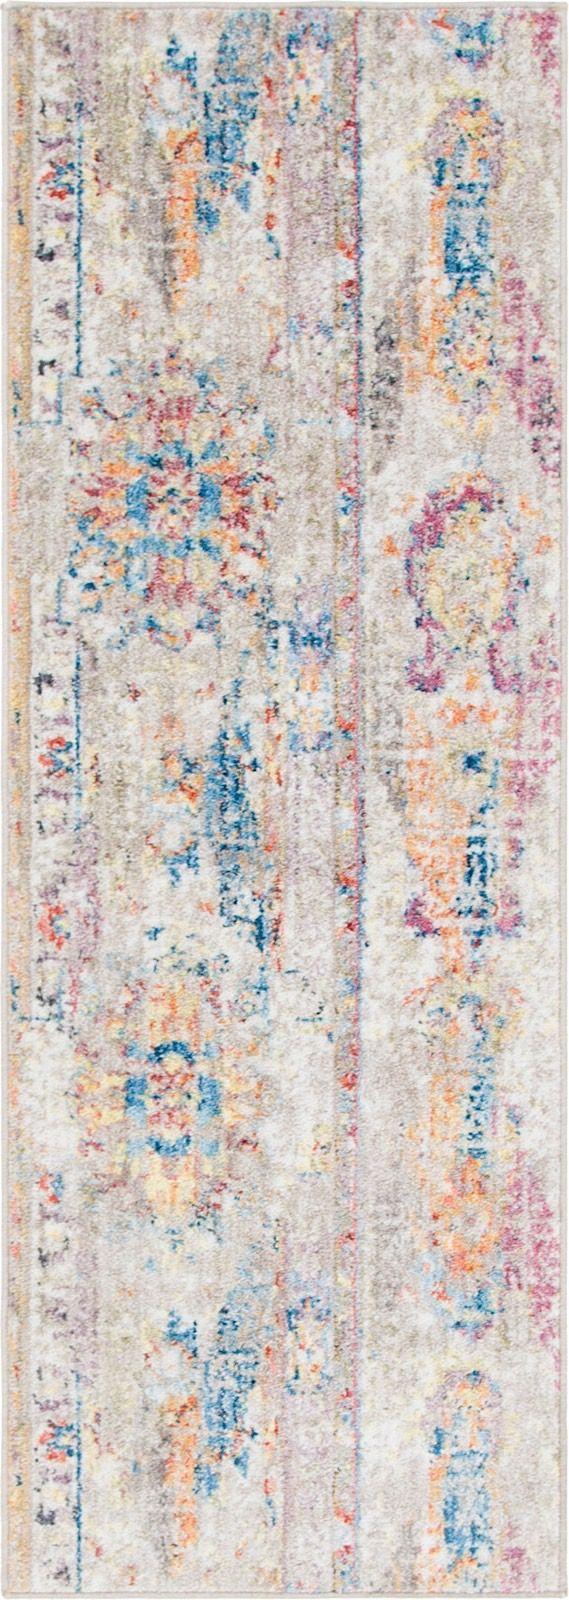 rugpal boheme southwestern/lodge area rug collection